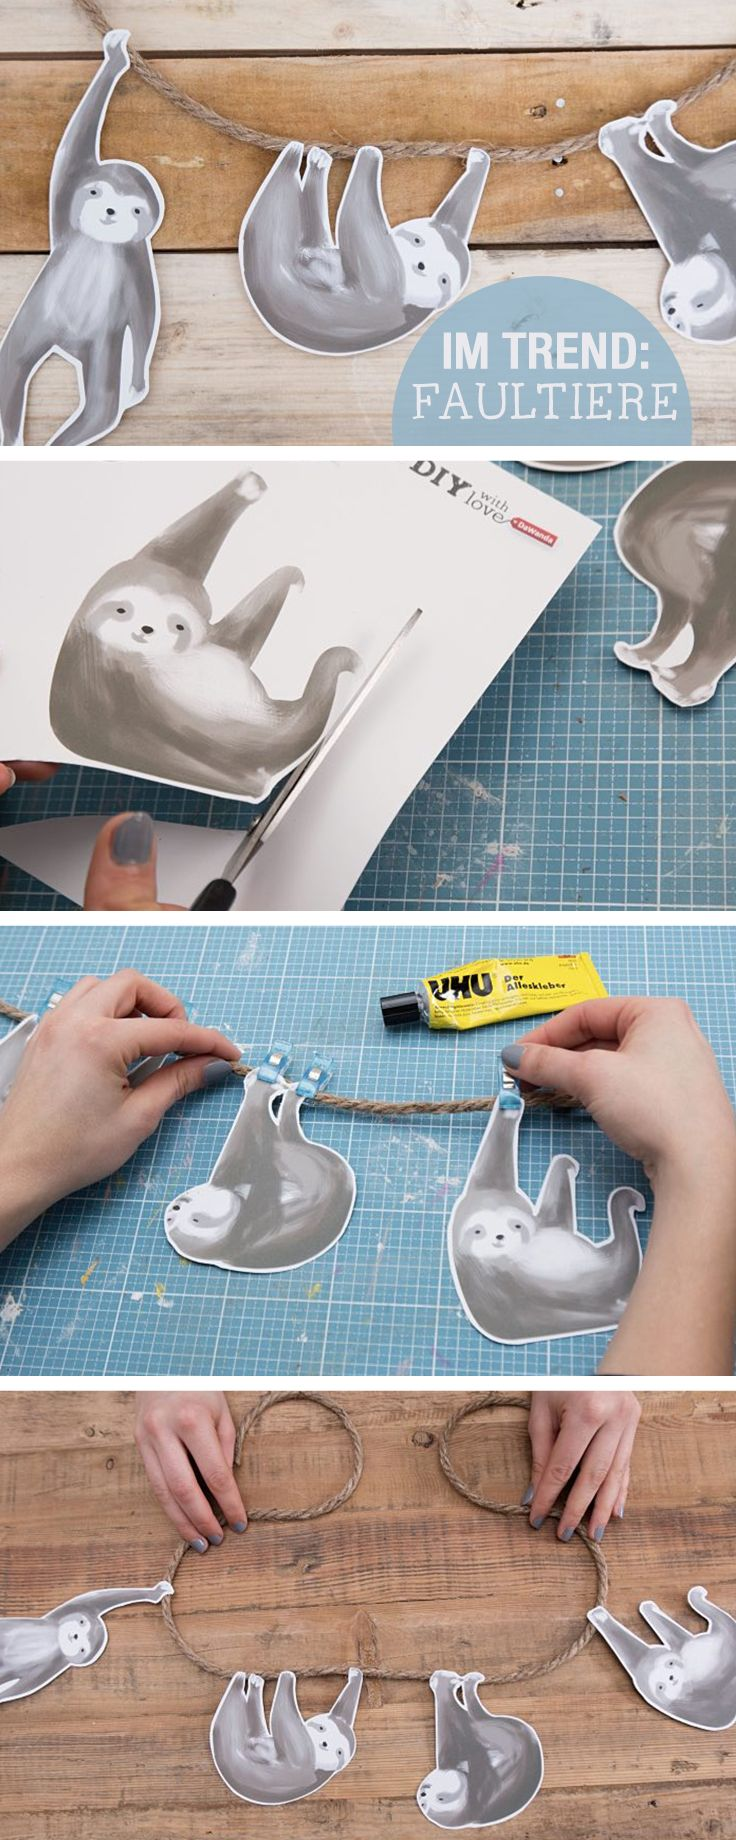 DIY-Anleitung: Girlande aus Faultieren basteln / diy tutorial: make a sloth garland, home decor, printable via DaWanda.com